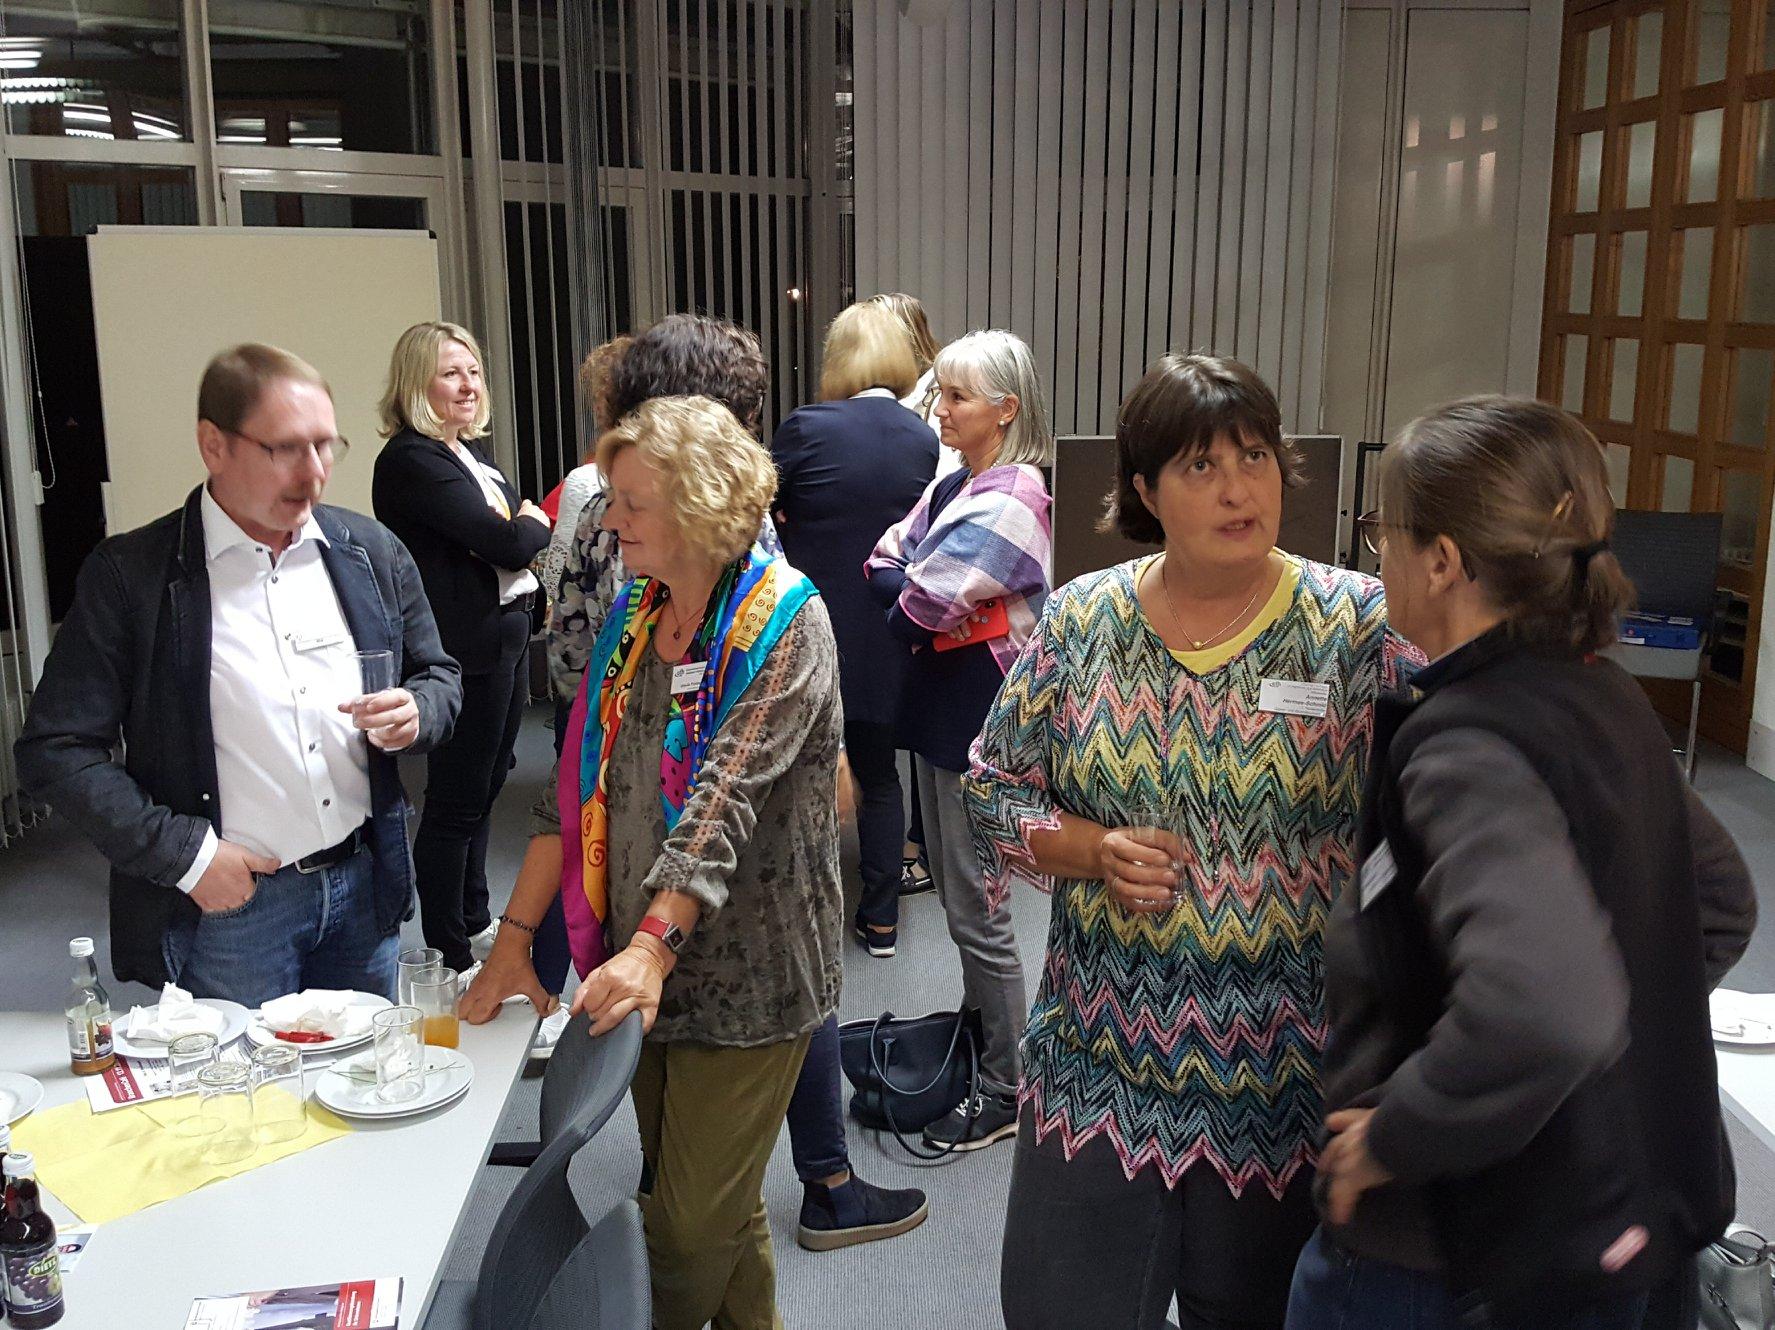 09-2019 Expertengespräch Arbeitsagentur in Rastatt